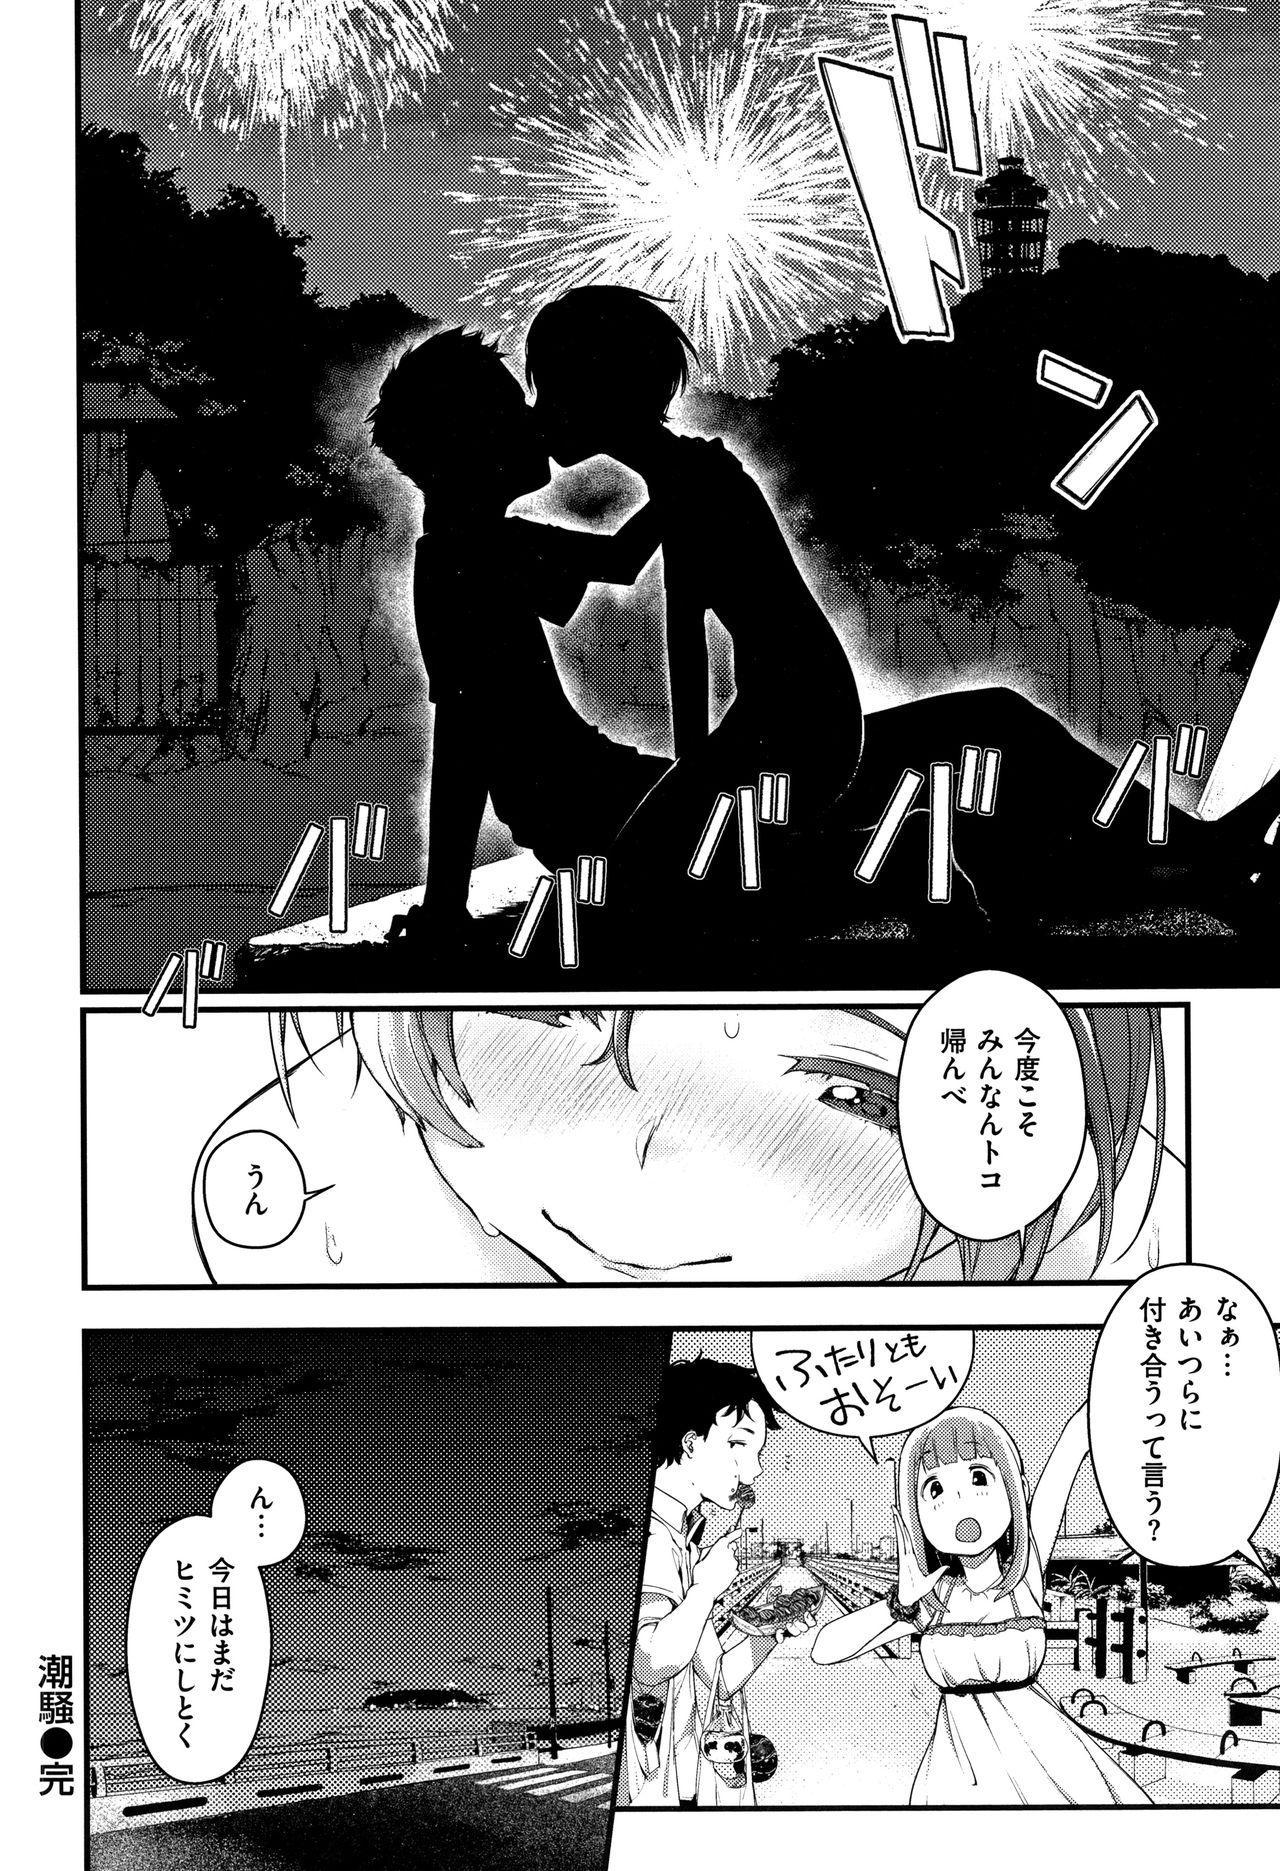 Haru to Ao - Our adolescence 166